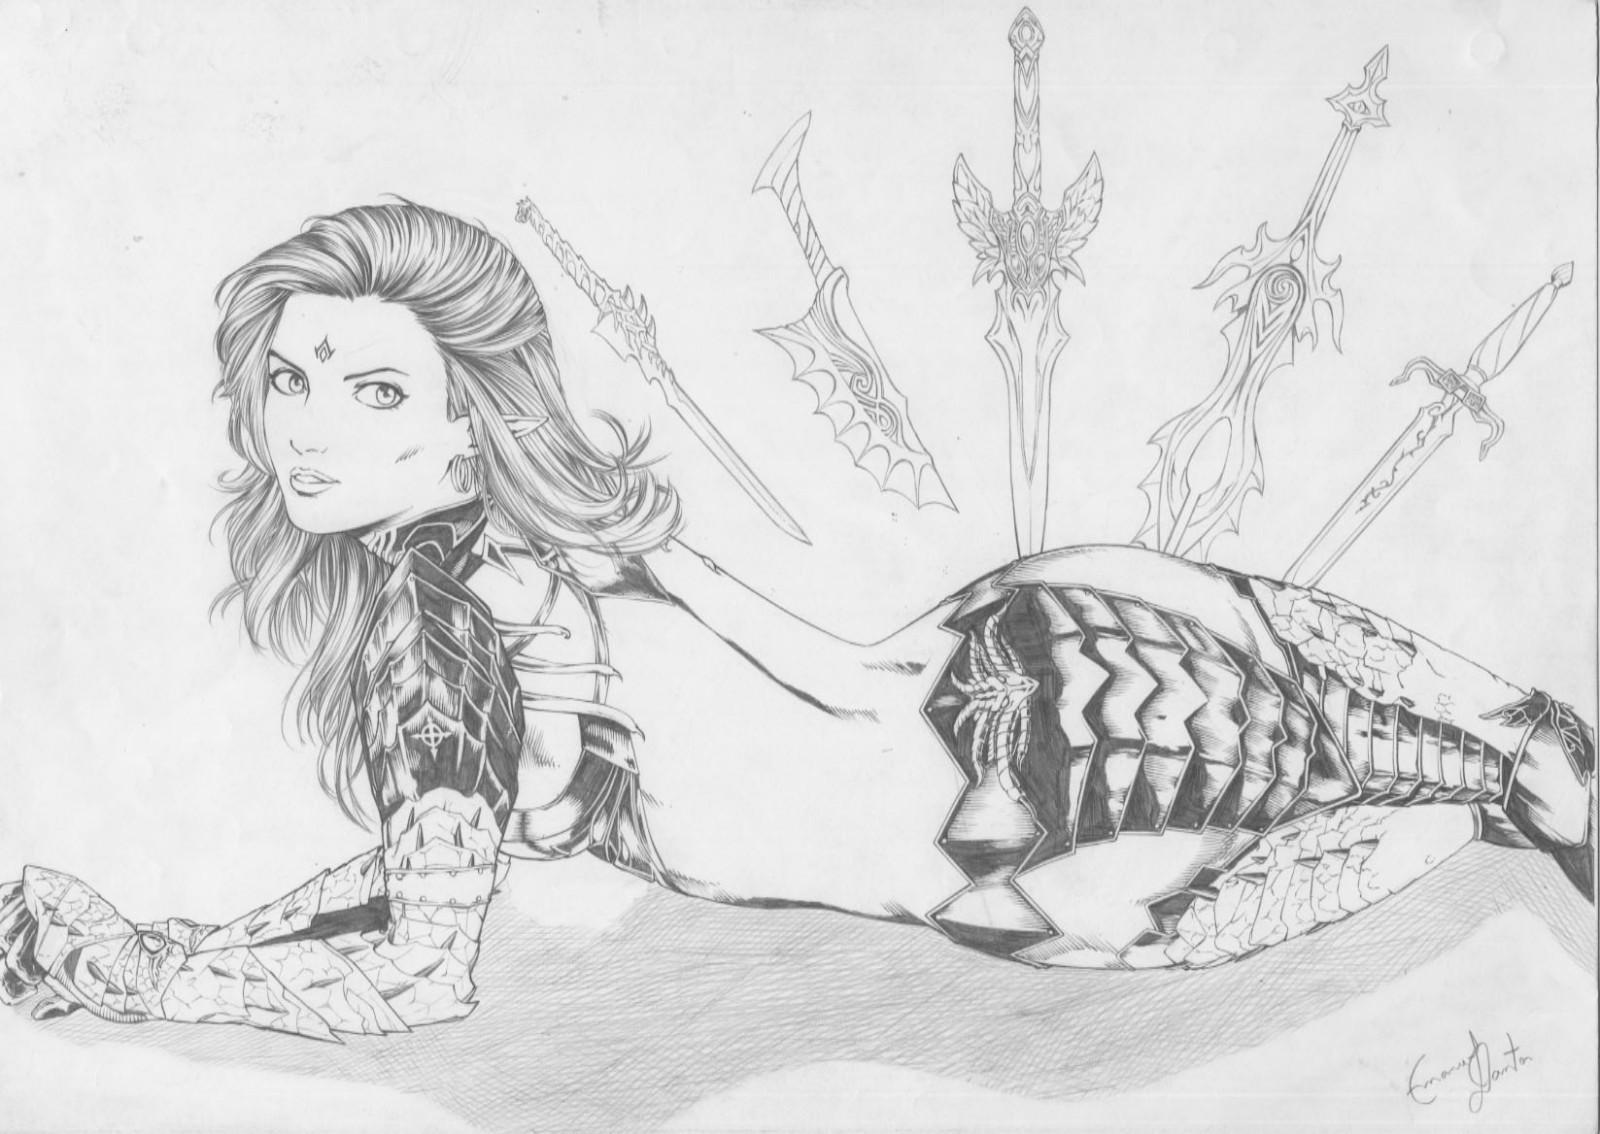 Drawn amour draconic Drawing ELF Art Pinup Dantos